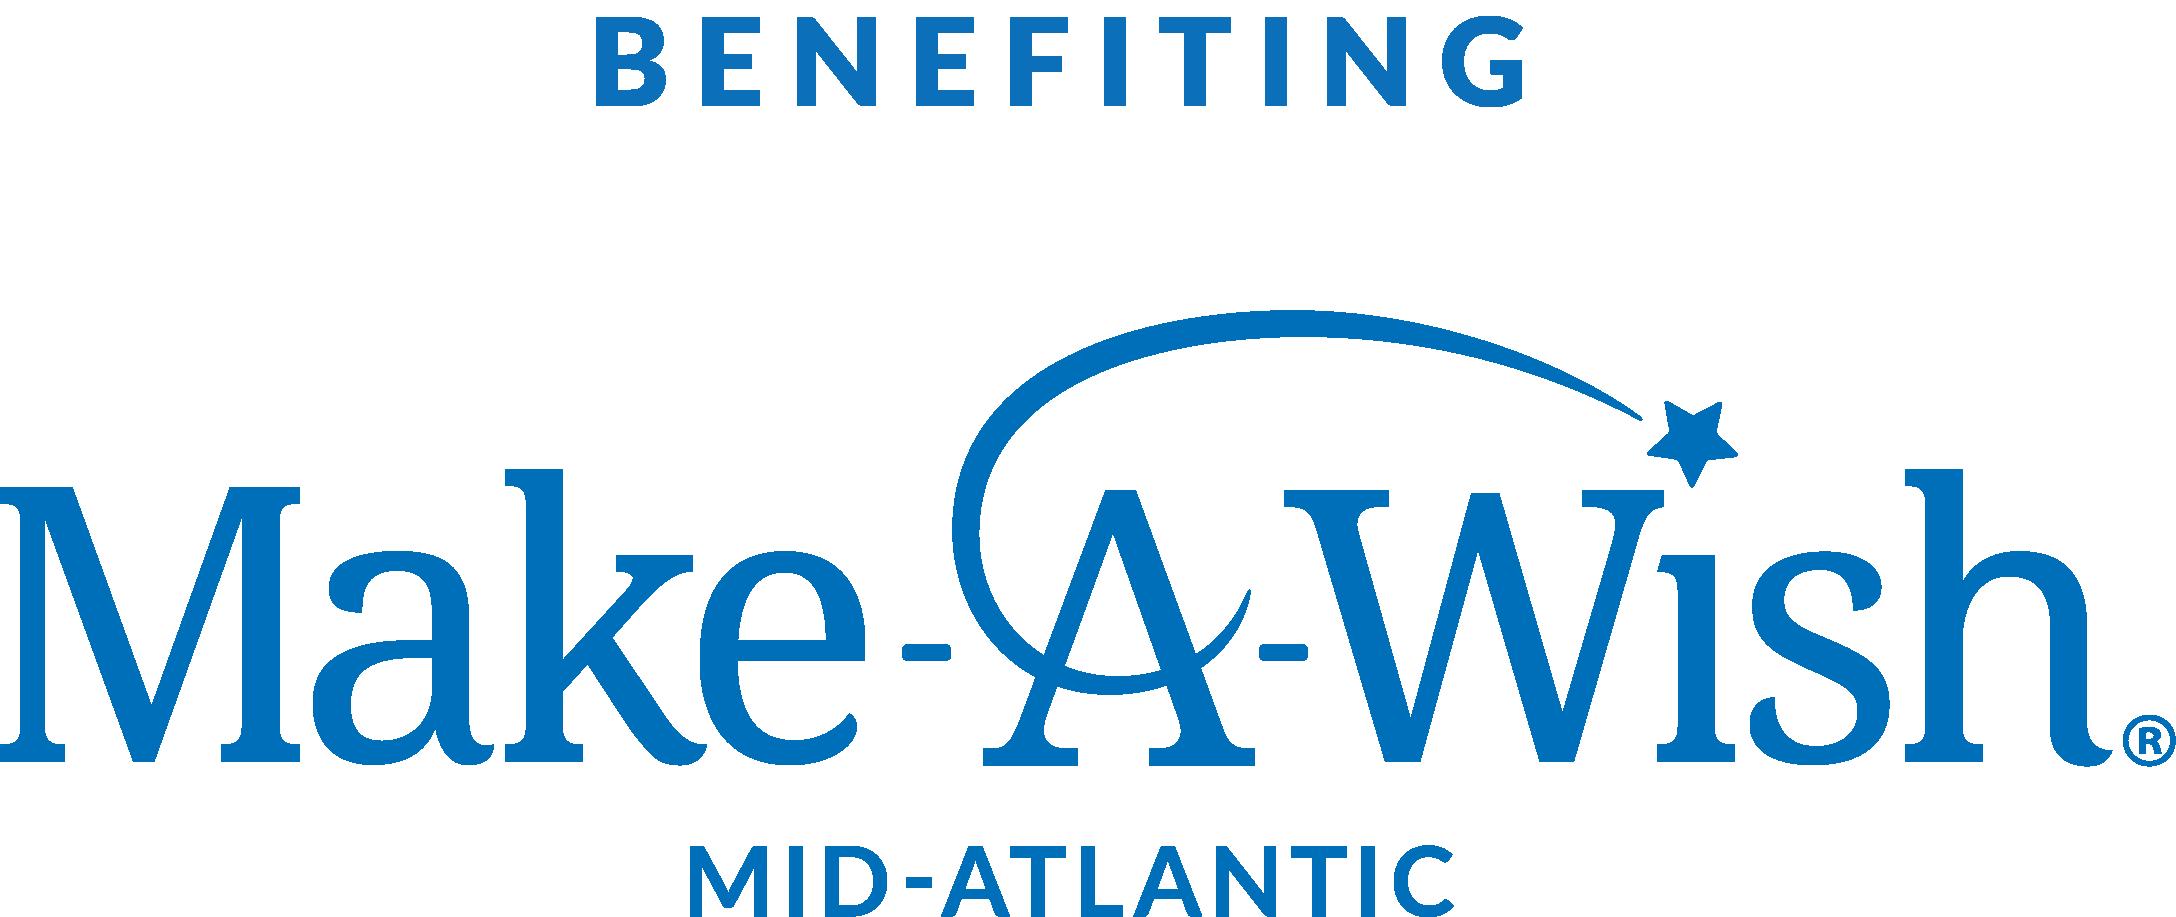 Make-A-Wish Mid-Atlantic